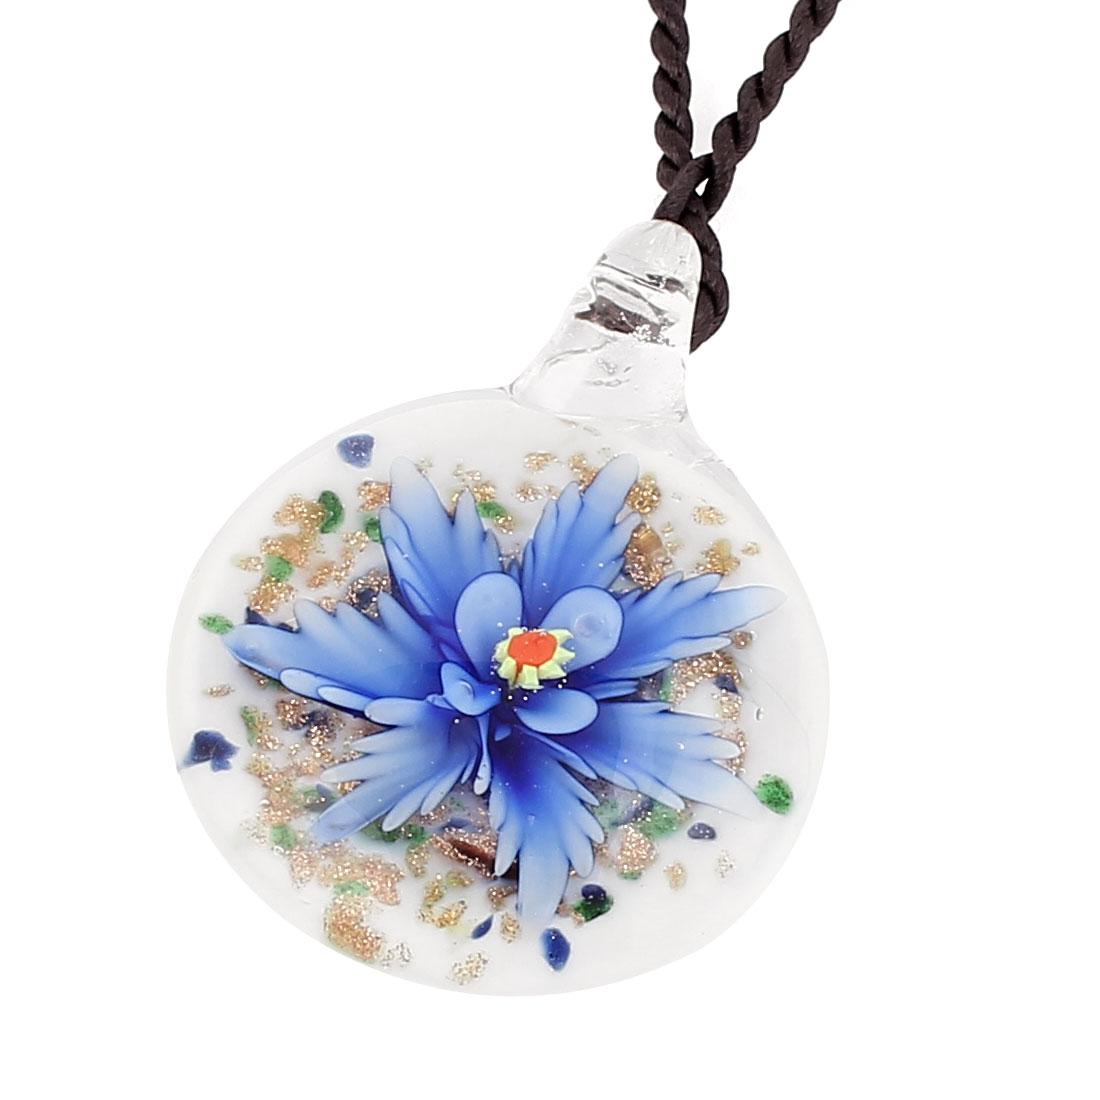 Nylon String Glass Pressed Flower Design Pendant Necklace Blue White